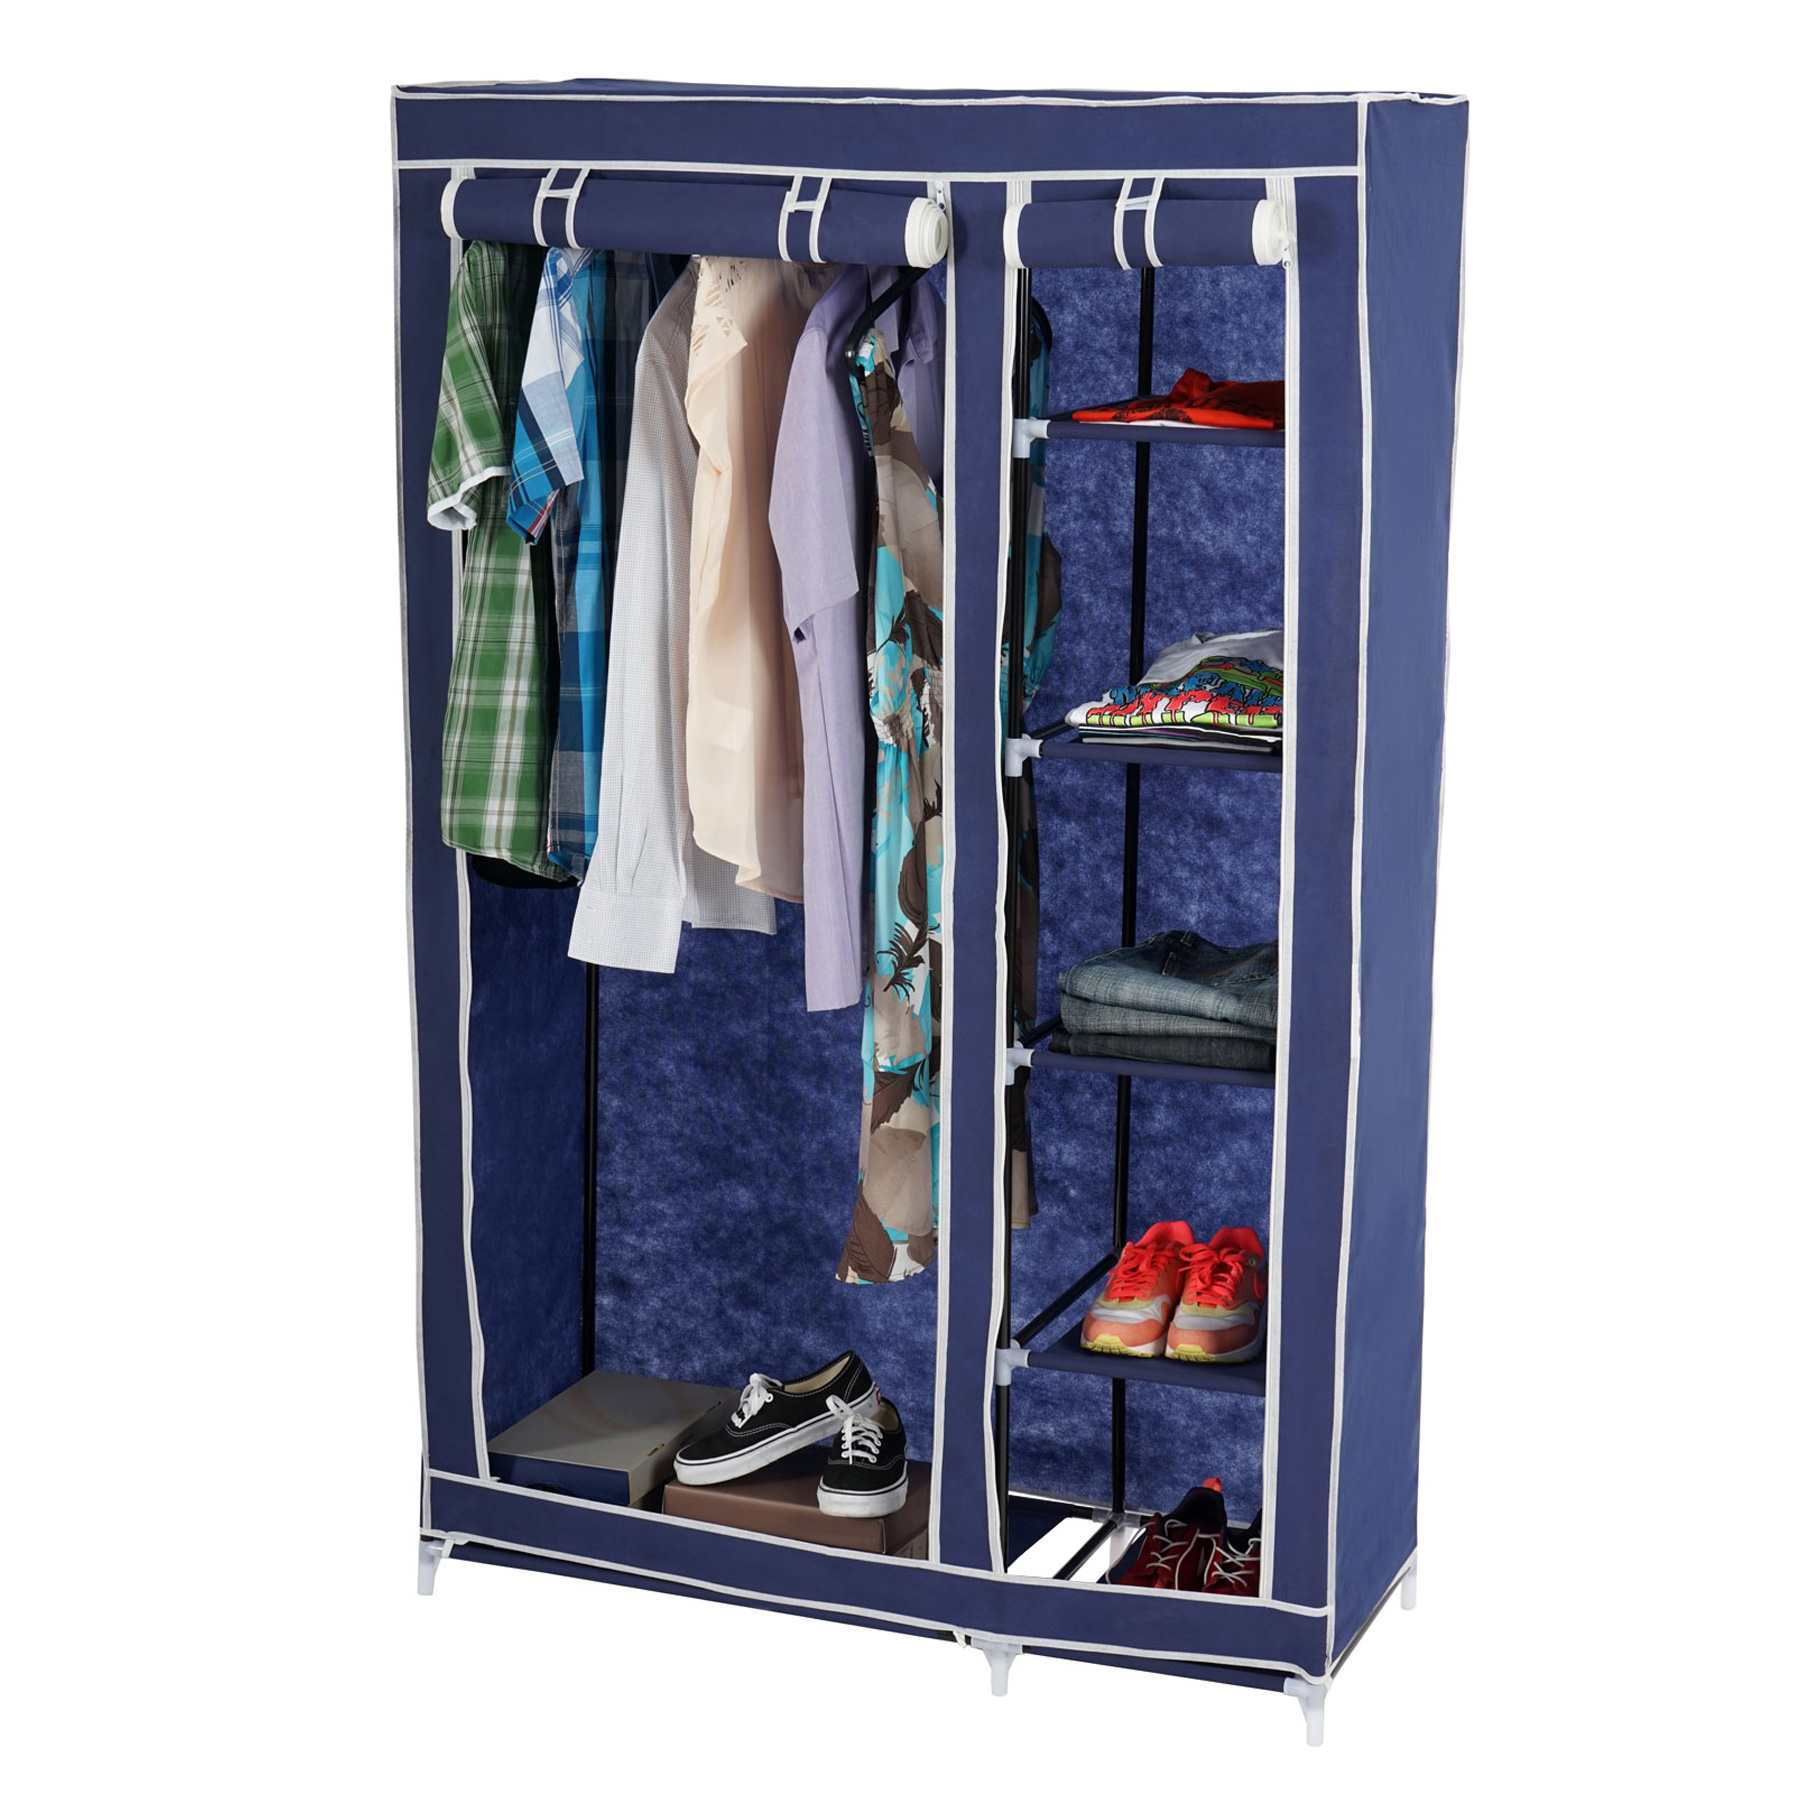 faltschrank campingschrank stoffschrank kleiderschrank. Black Bedroom Furniture Sets. Home Design Ideas